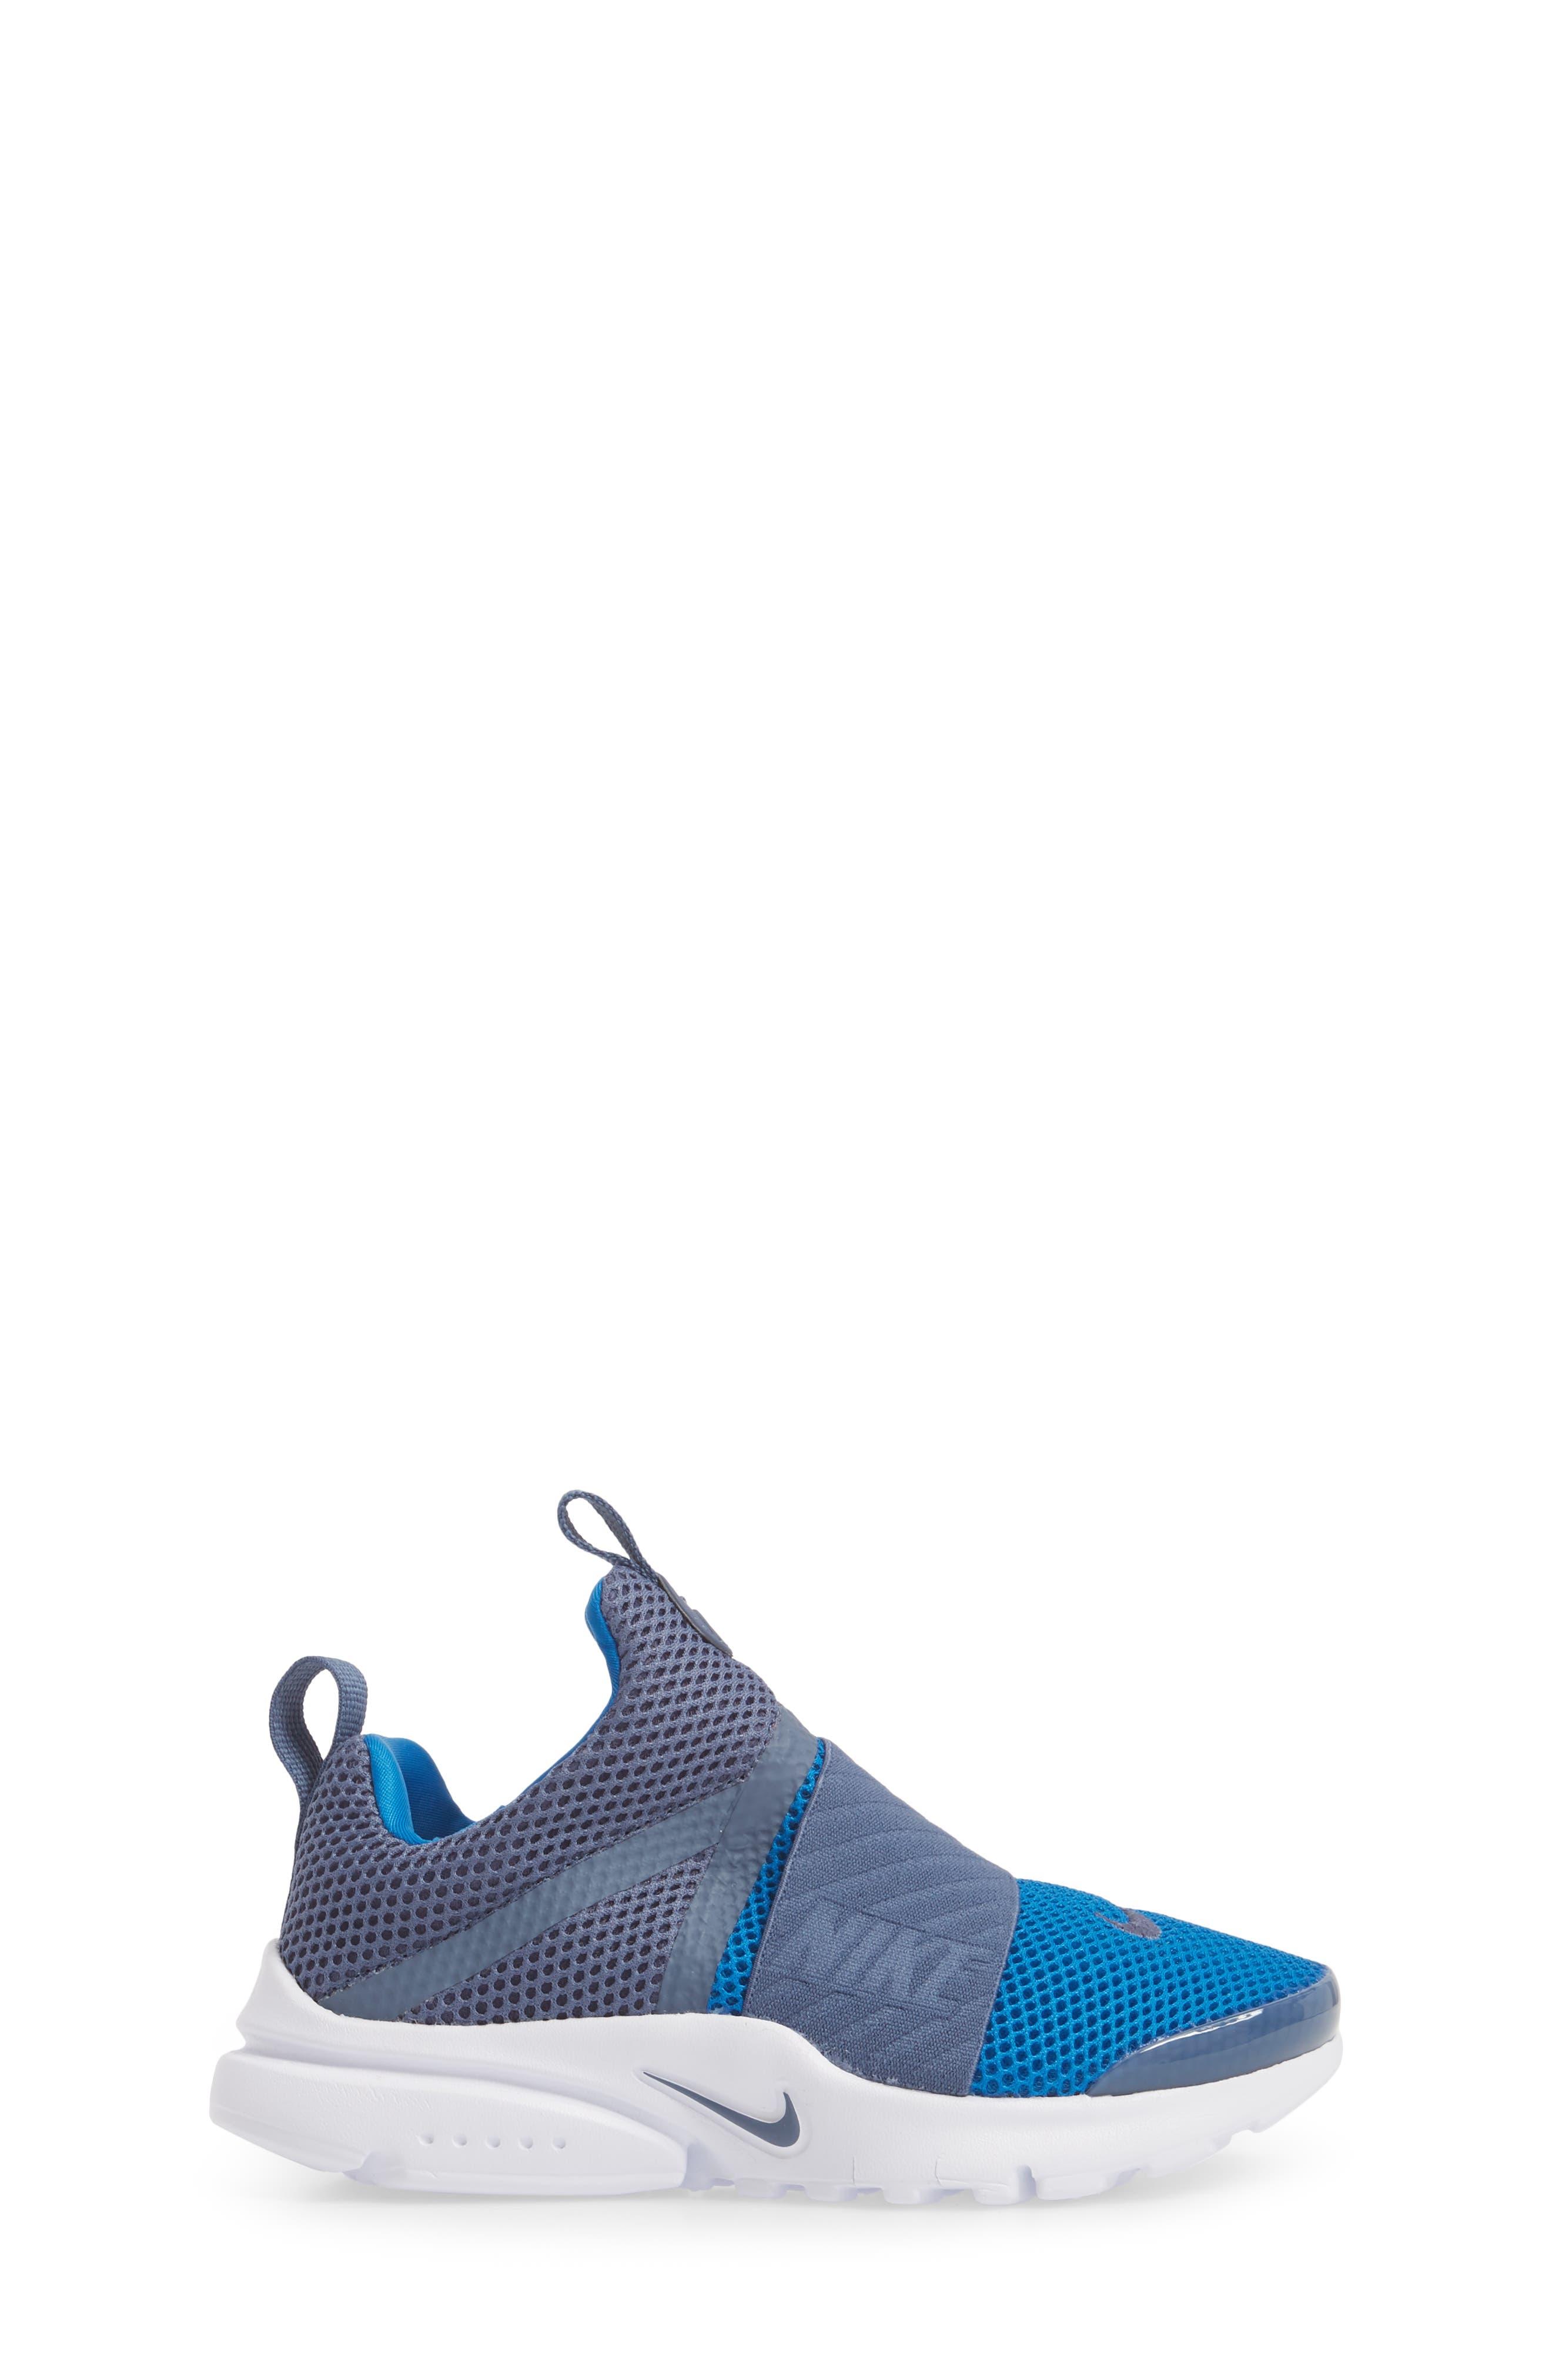 Presto Extreme Sneaker,                             Alternate thumbnail 27, color,